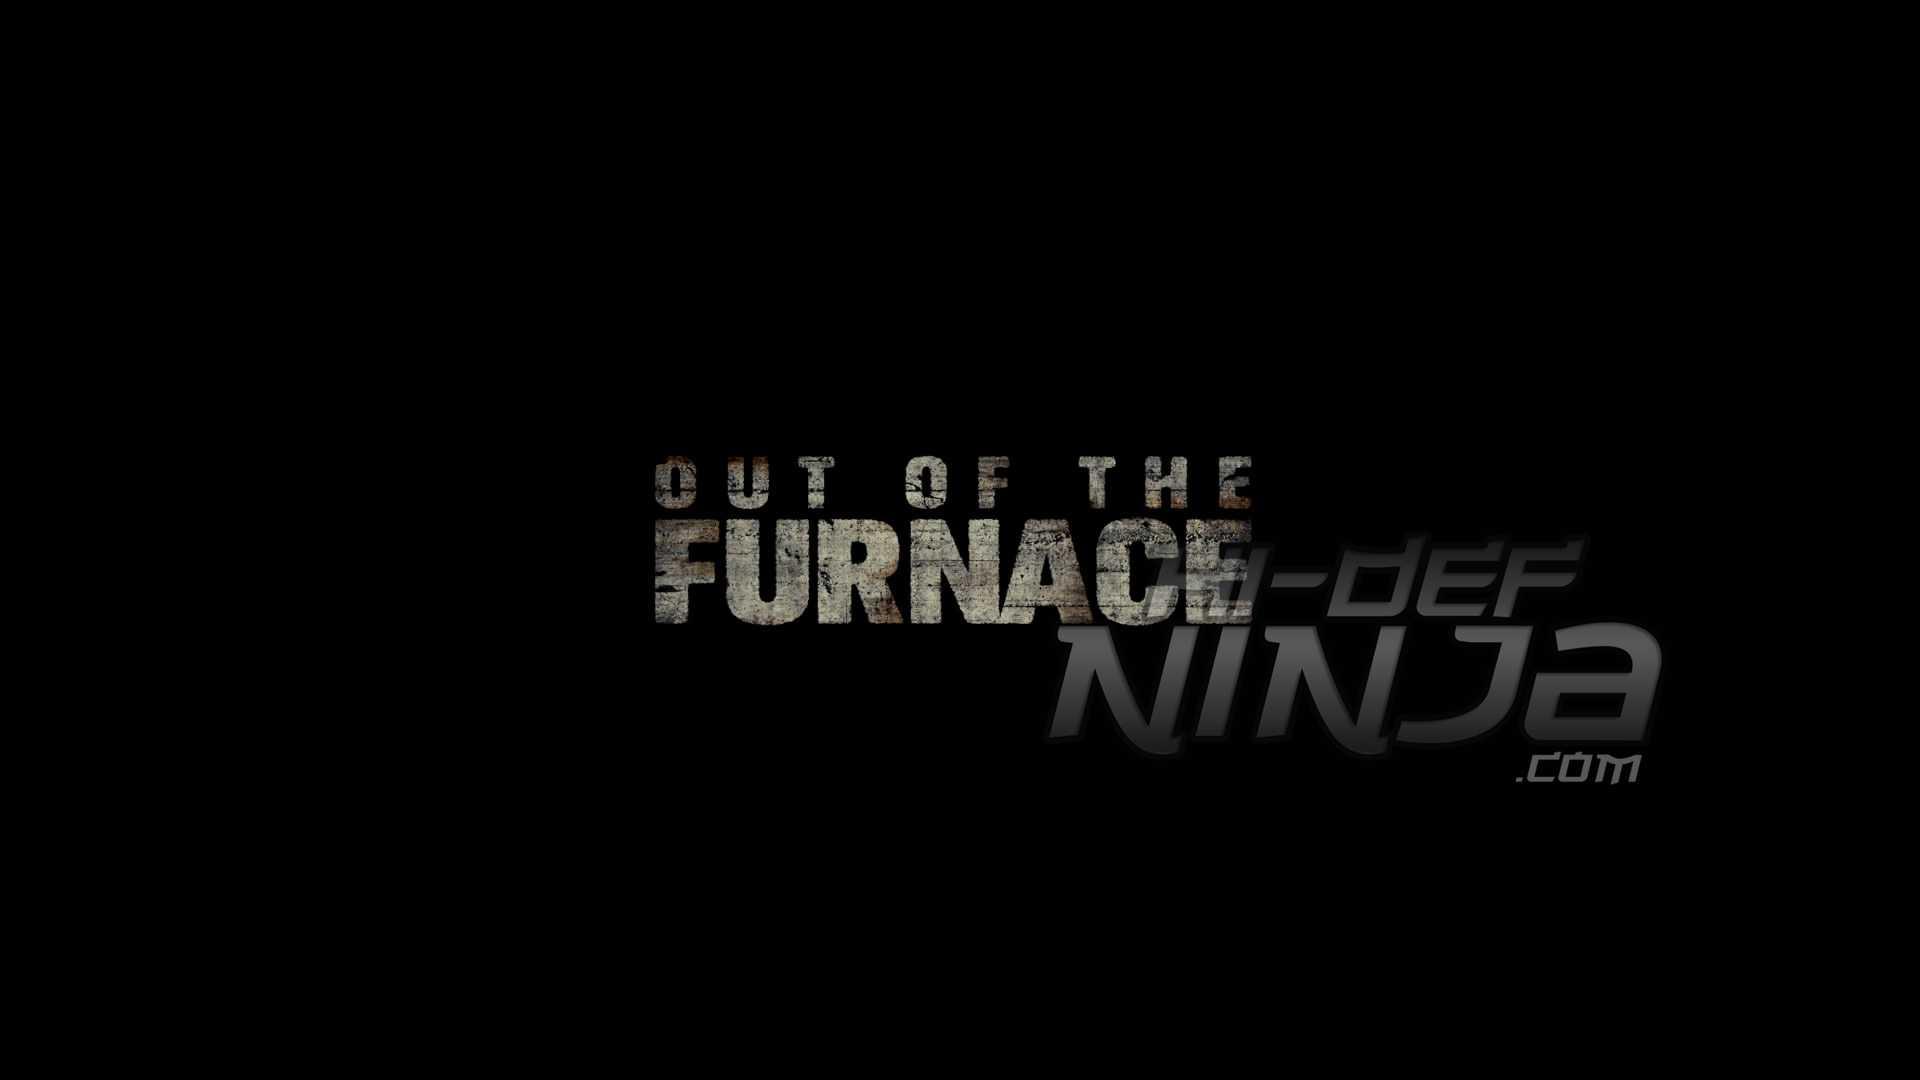 OutoftheFurnace1